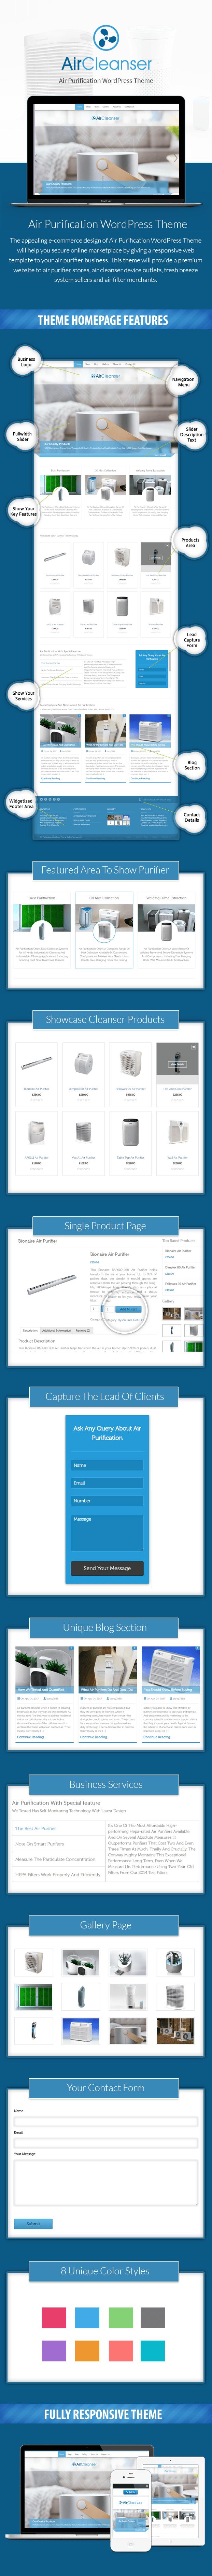 Air Purification WordPress Theme